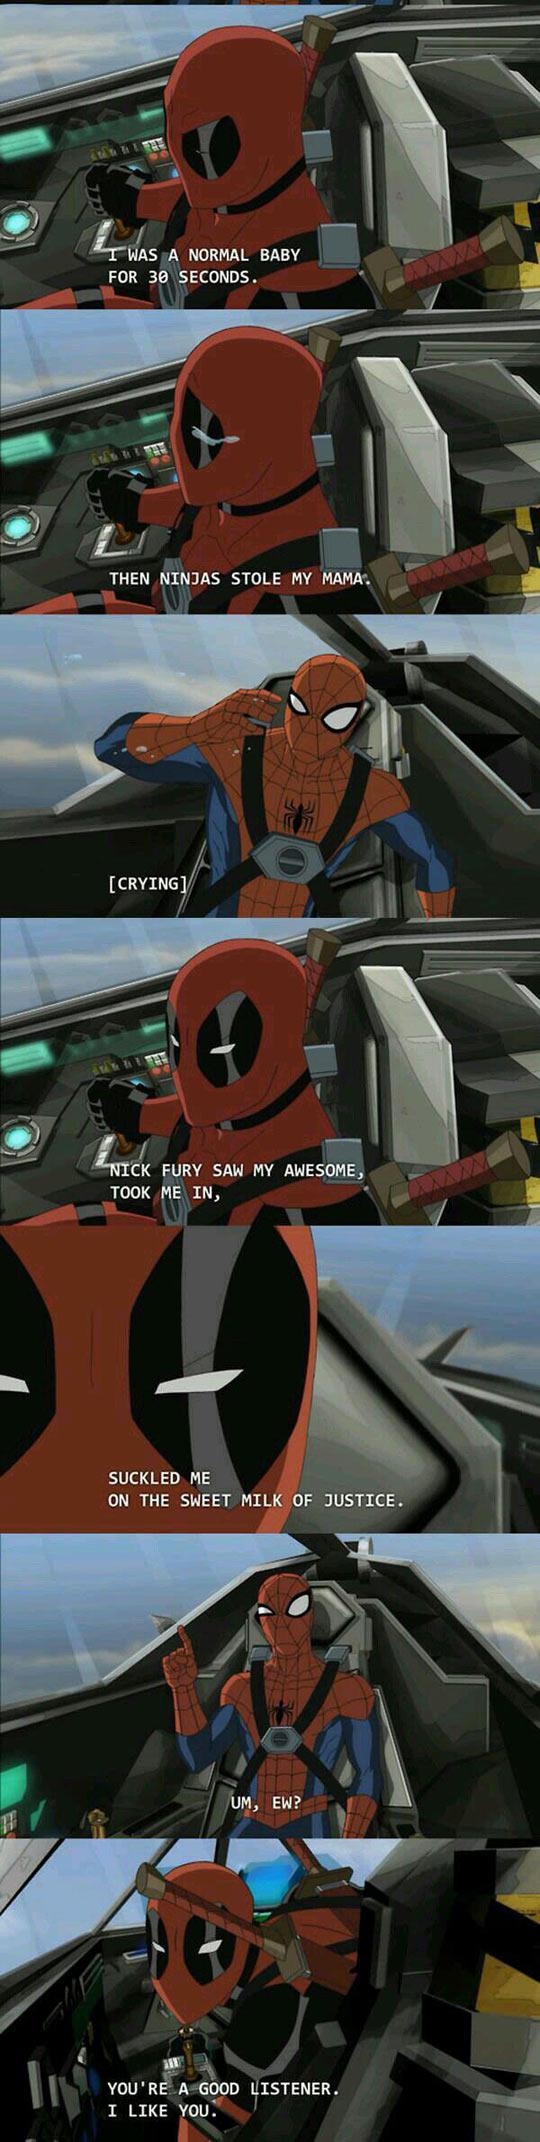 funny-Deadpool-story-origin-Spiderman-flying